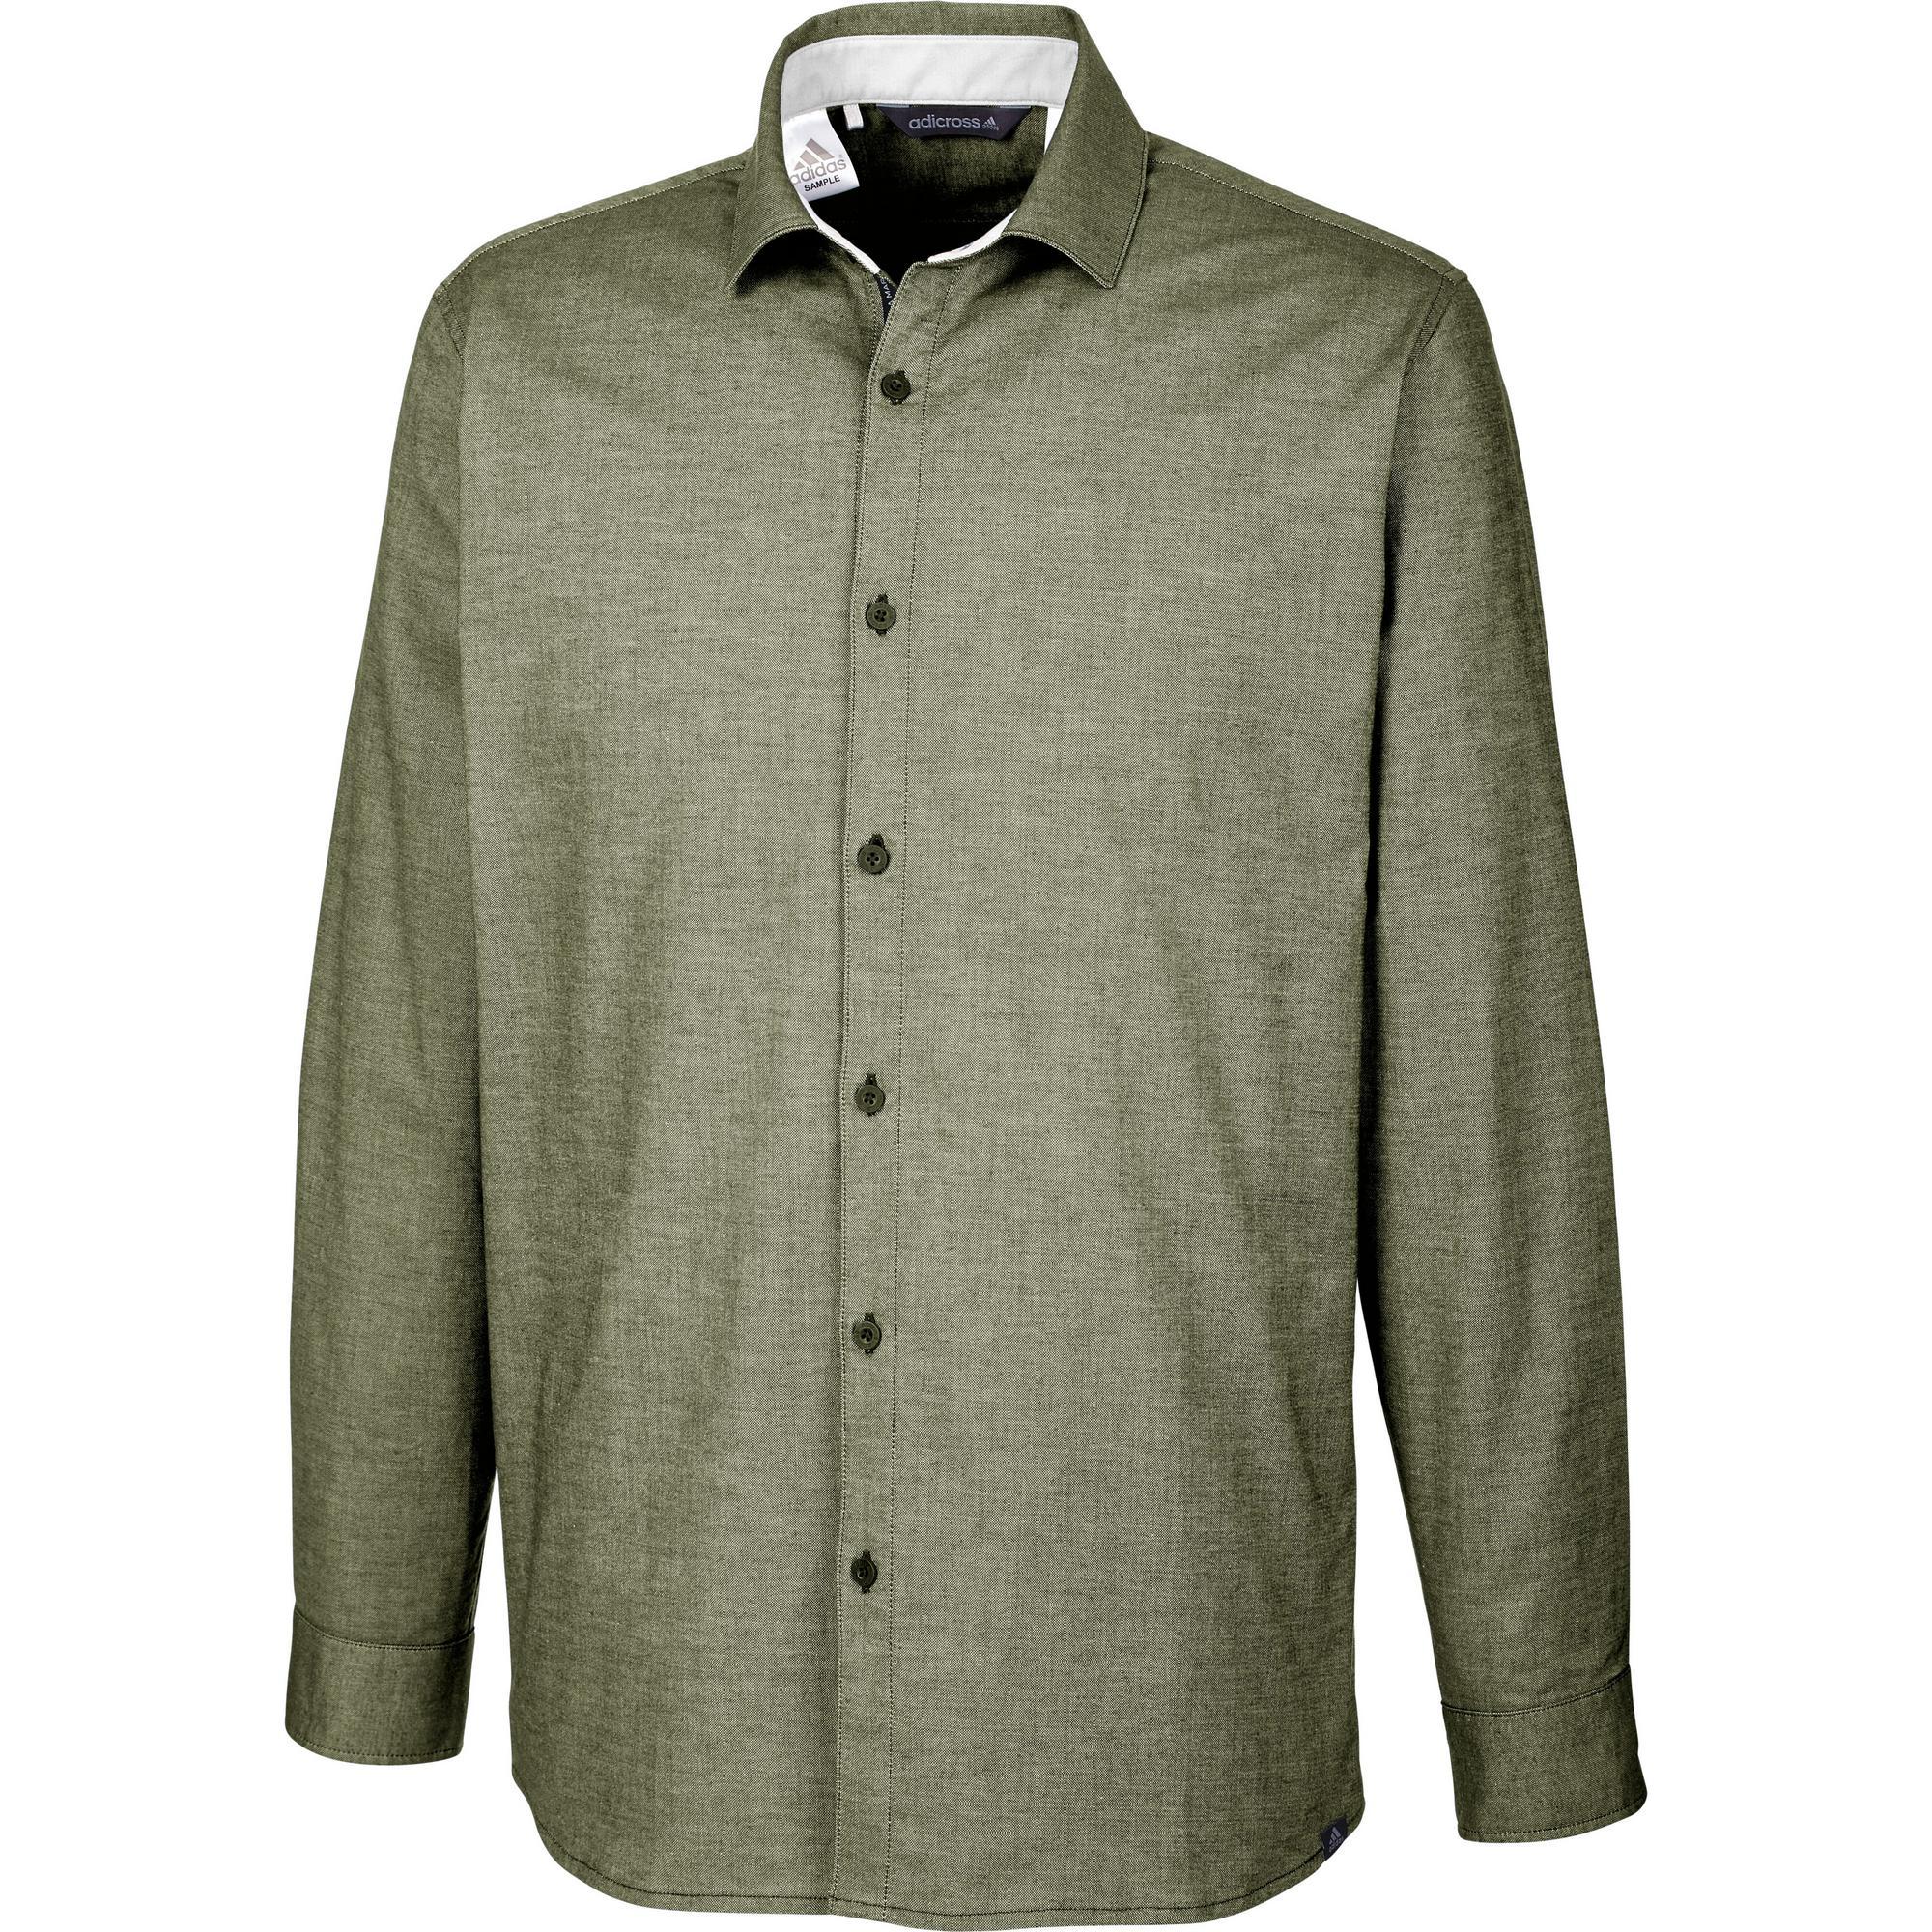 Men's adicross Beyond 18 Stretch Woven Oxford Long Sleeve Shirt